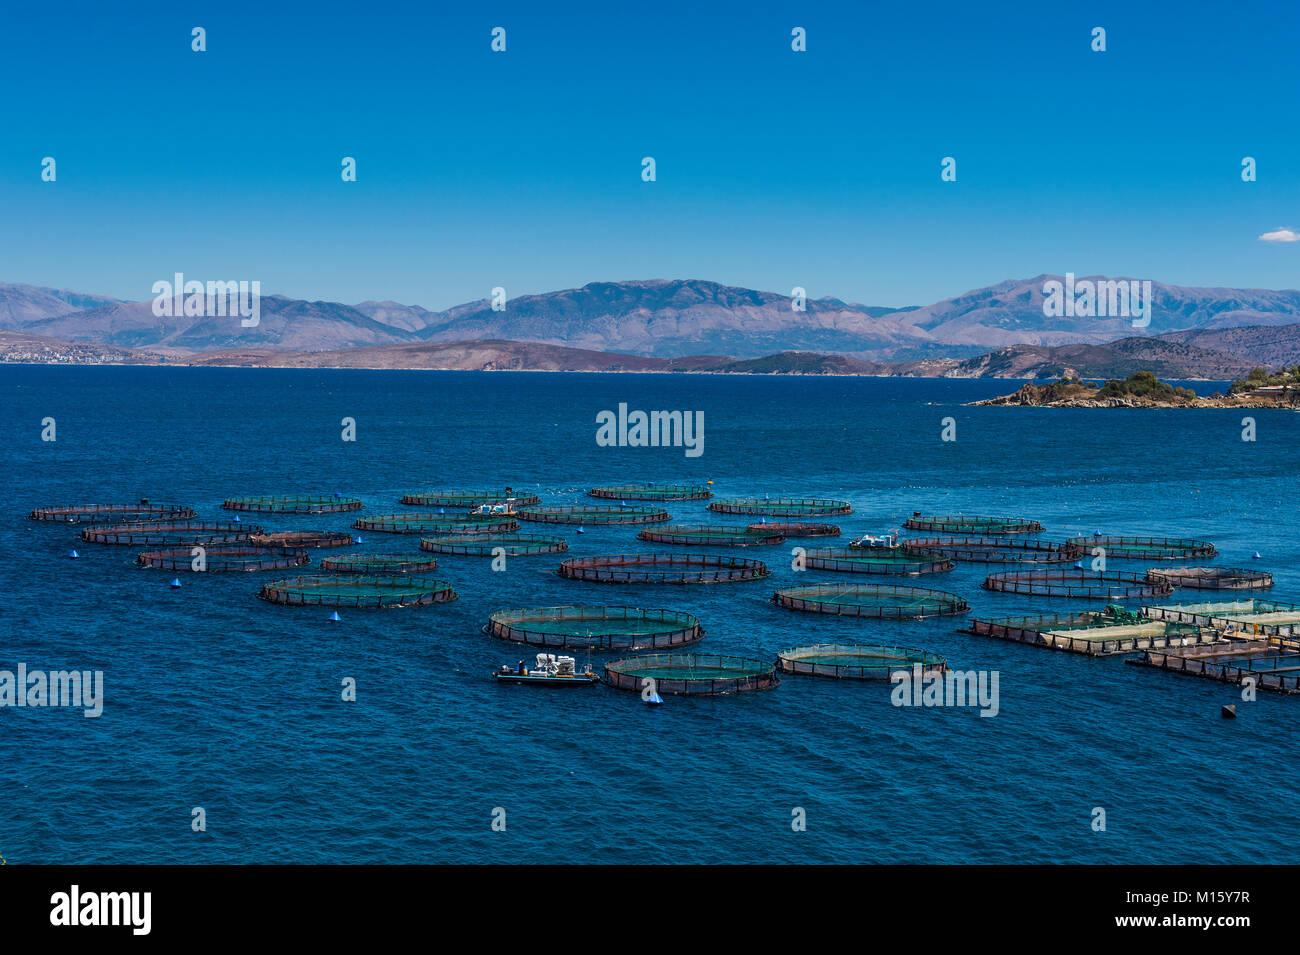 Fishfarm in Kassiopi,Corfu,Ionian Islands,Greece - Stock Image